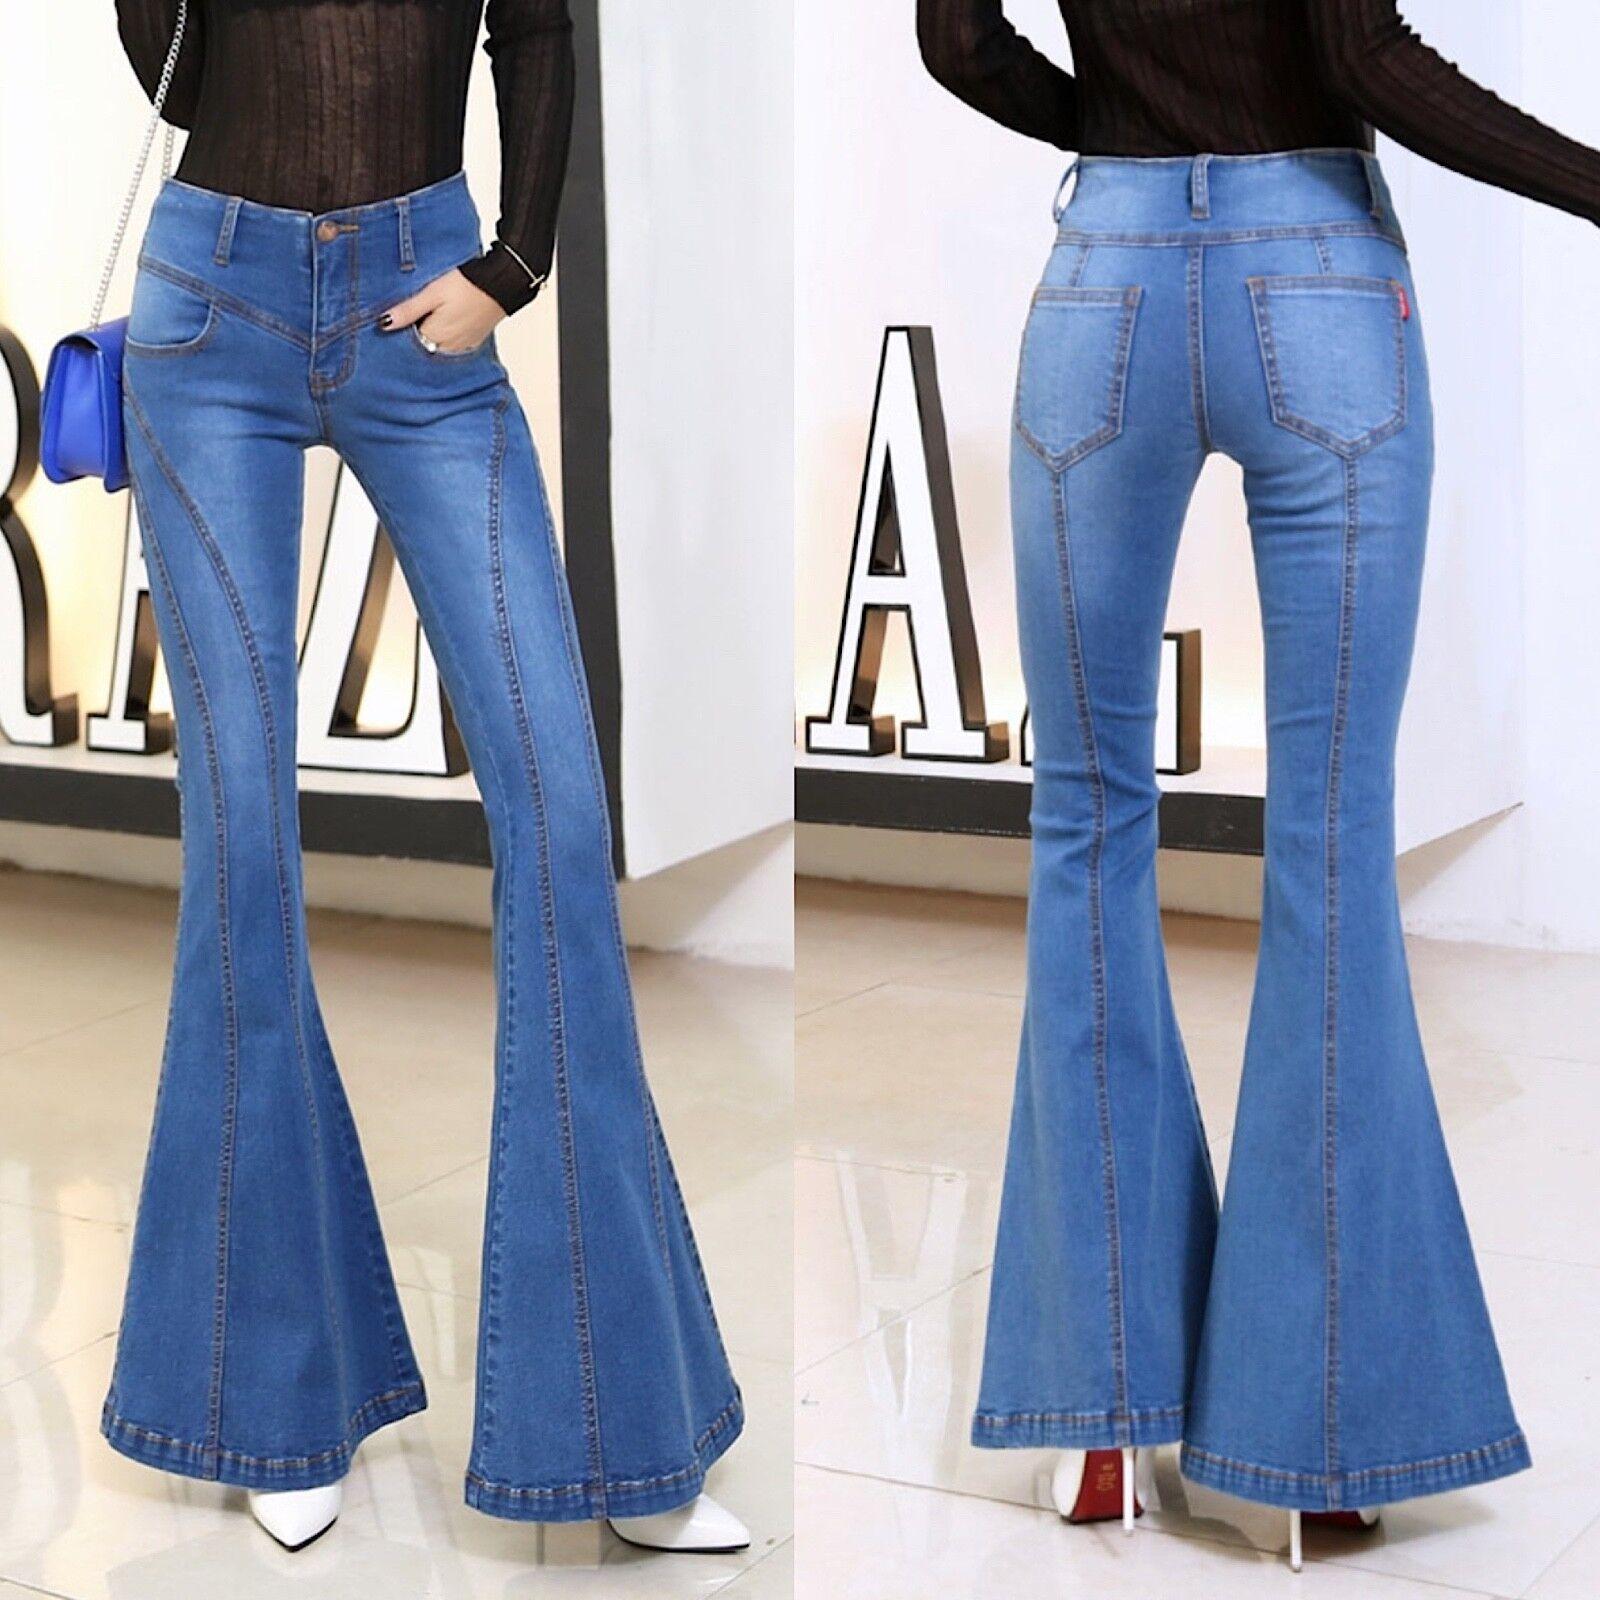 Jeans femmes Pantaloni a Zampa Larghi Sotto femme Denim Jeans JEA012 P